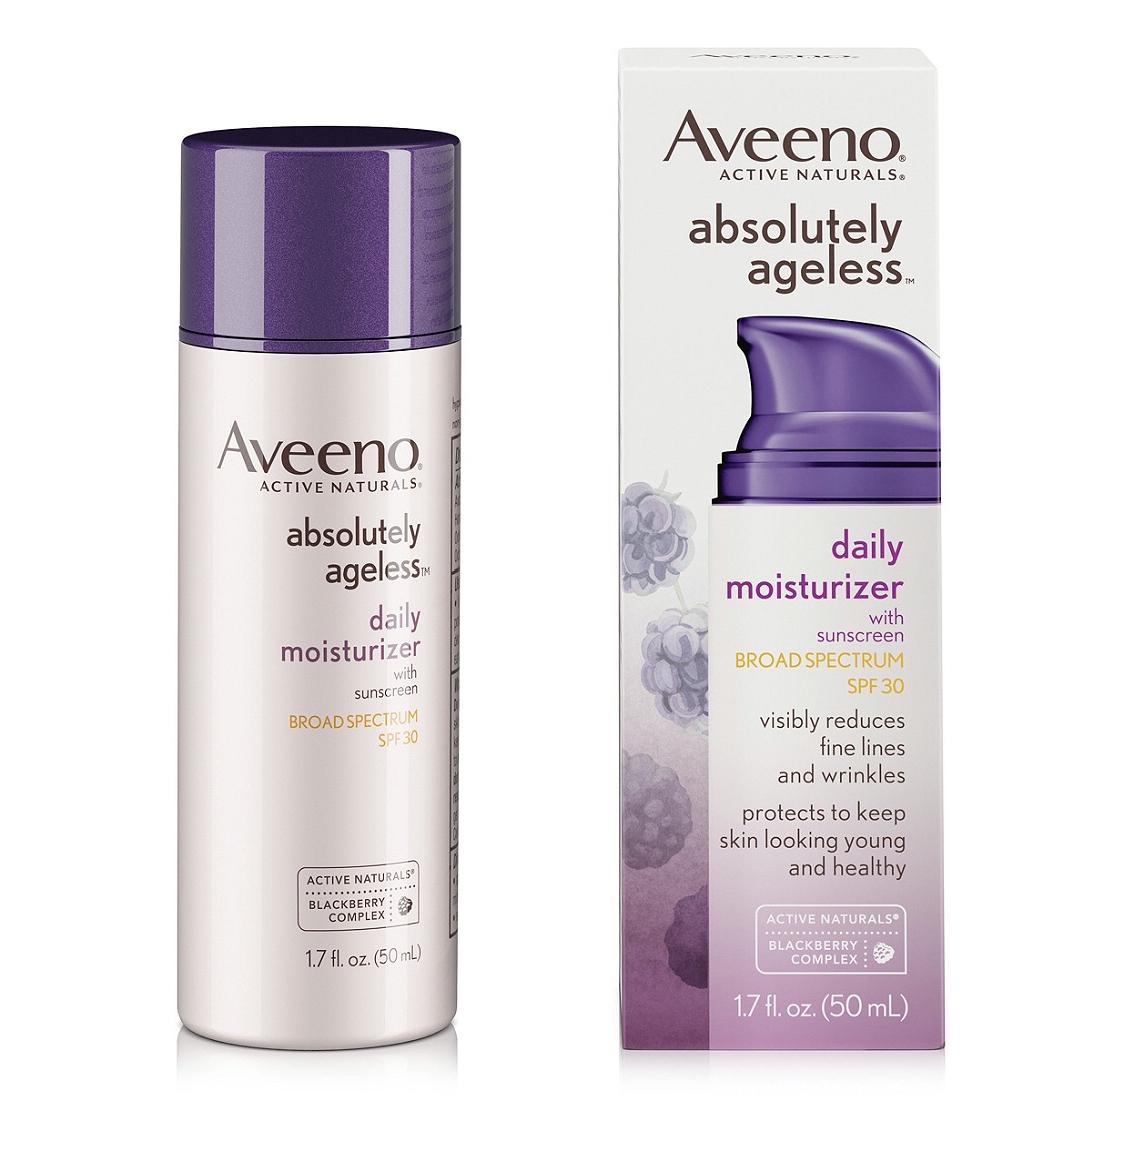 Aveeno Absolutely Ageless Daily Moisturizer Spf 30